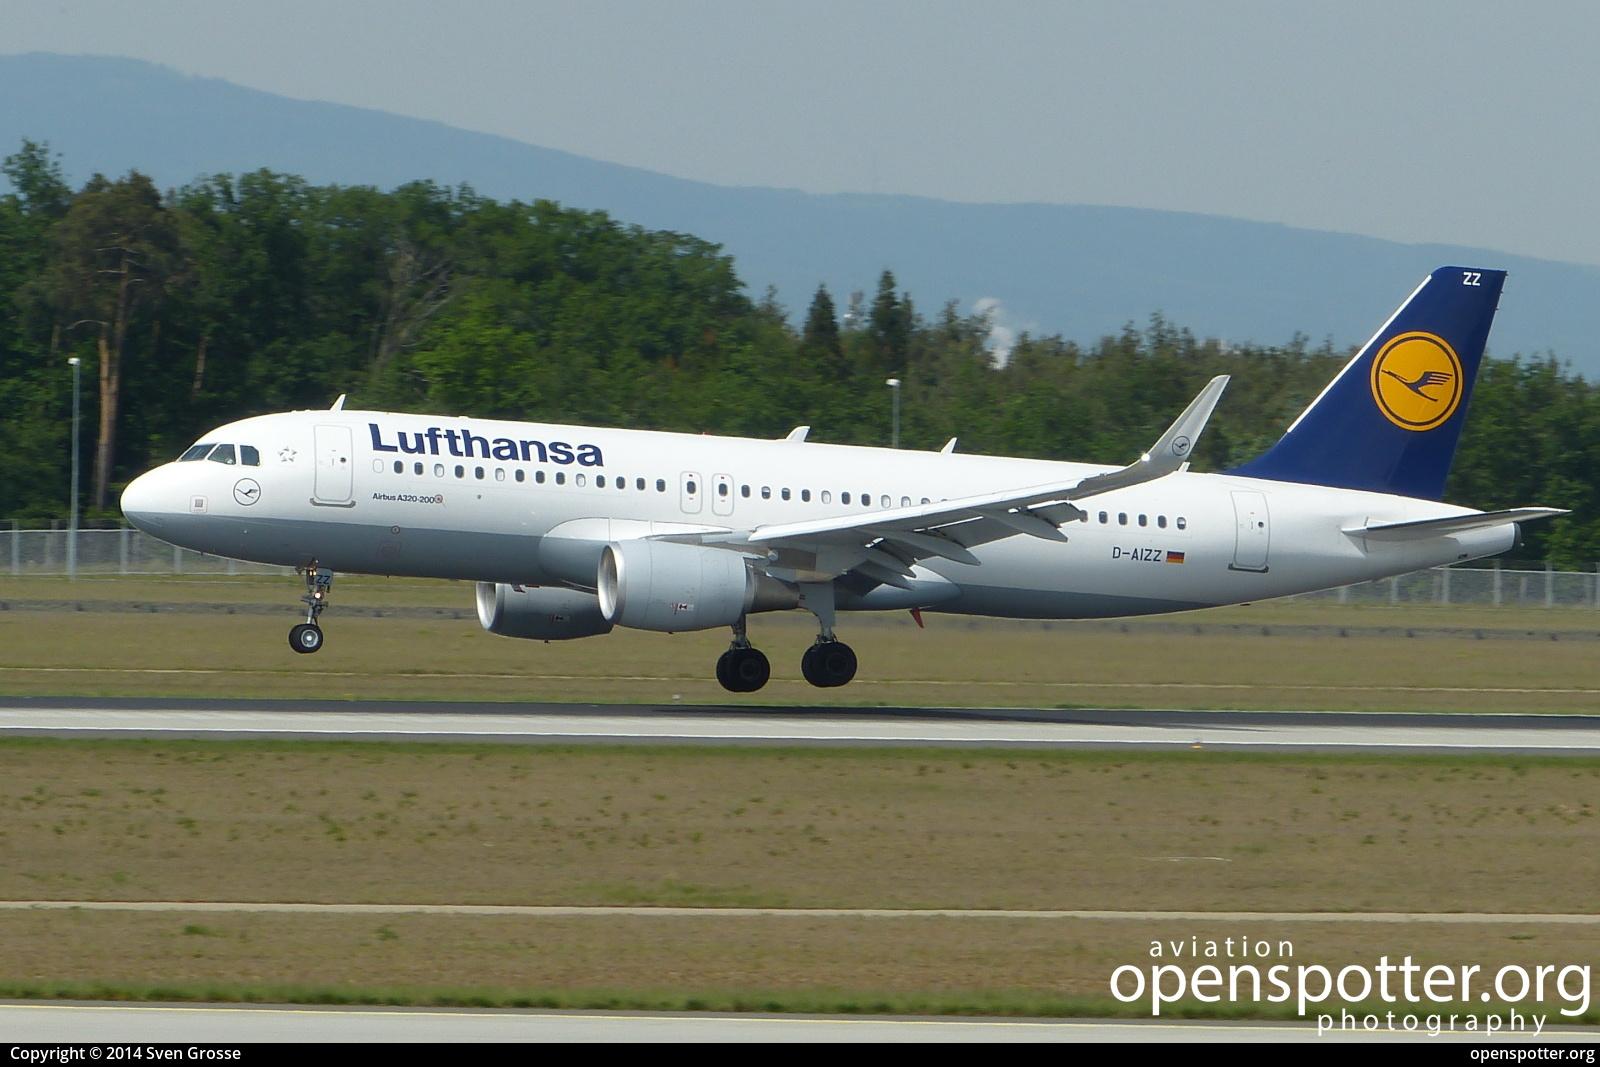 D-AIZZ - Lufthansa Airbus A320-214(WL) at Frankfurt International Airport (FRA/EDDF) taken by Sven Grosse | openspotter.org | ID: 51512